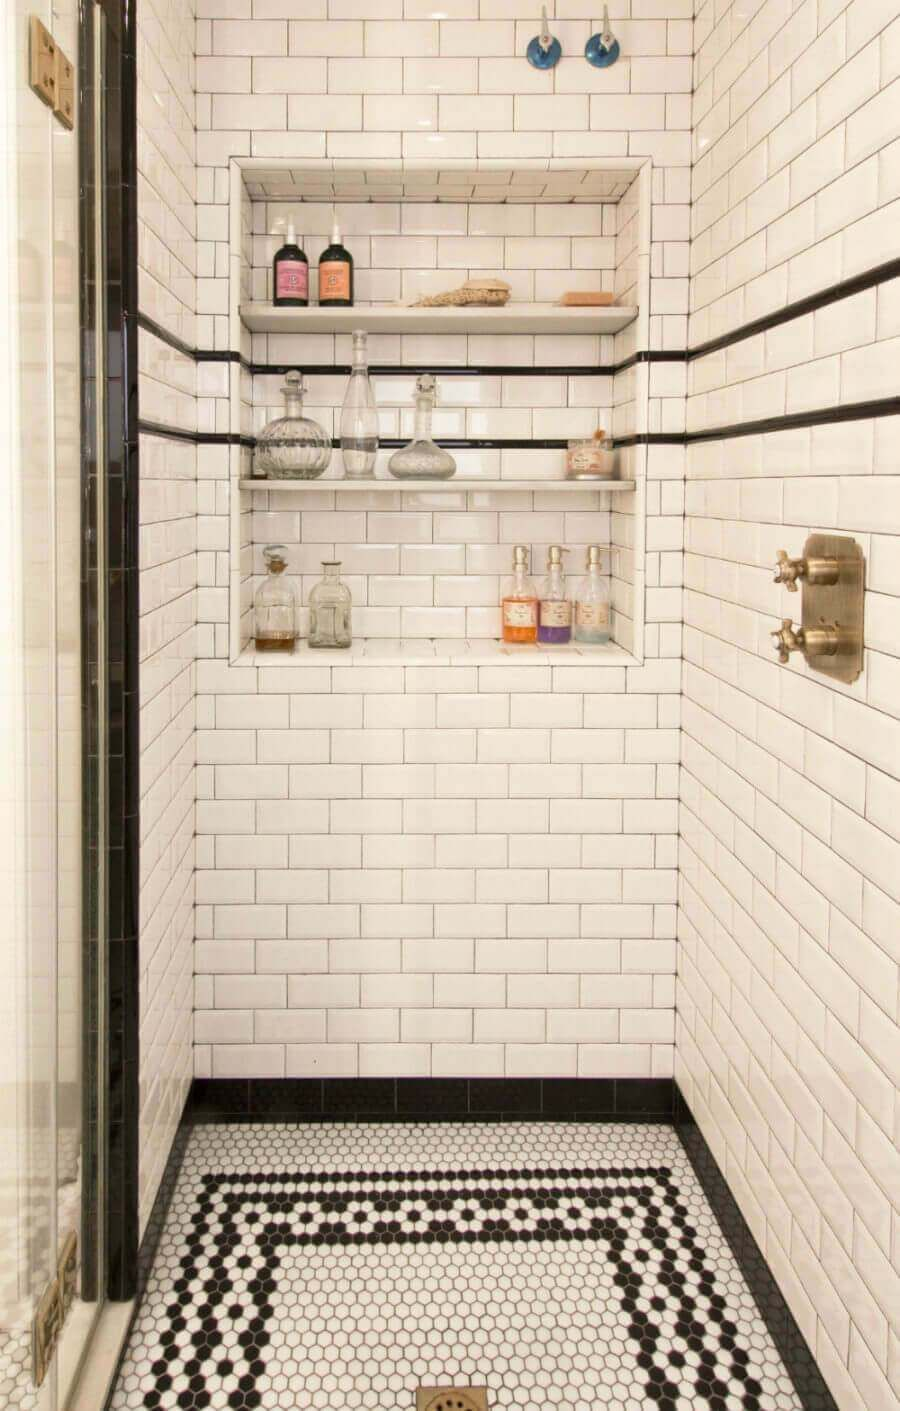 31 Stunning Shower Tile Ideas For Your Bathroom Farmfoodfamily Bathrooms Remodel Bathroom Inspiration Bathroom Design